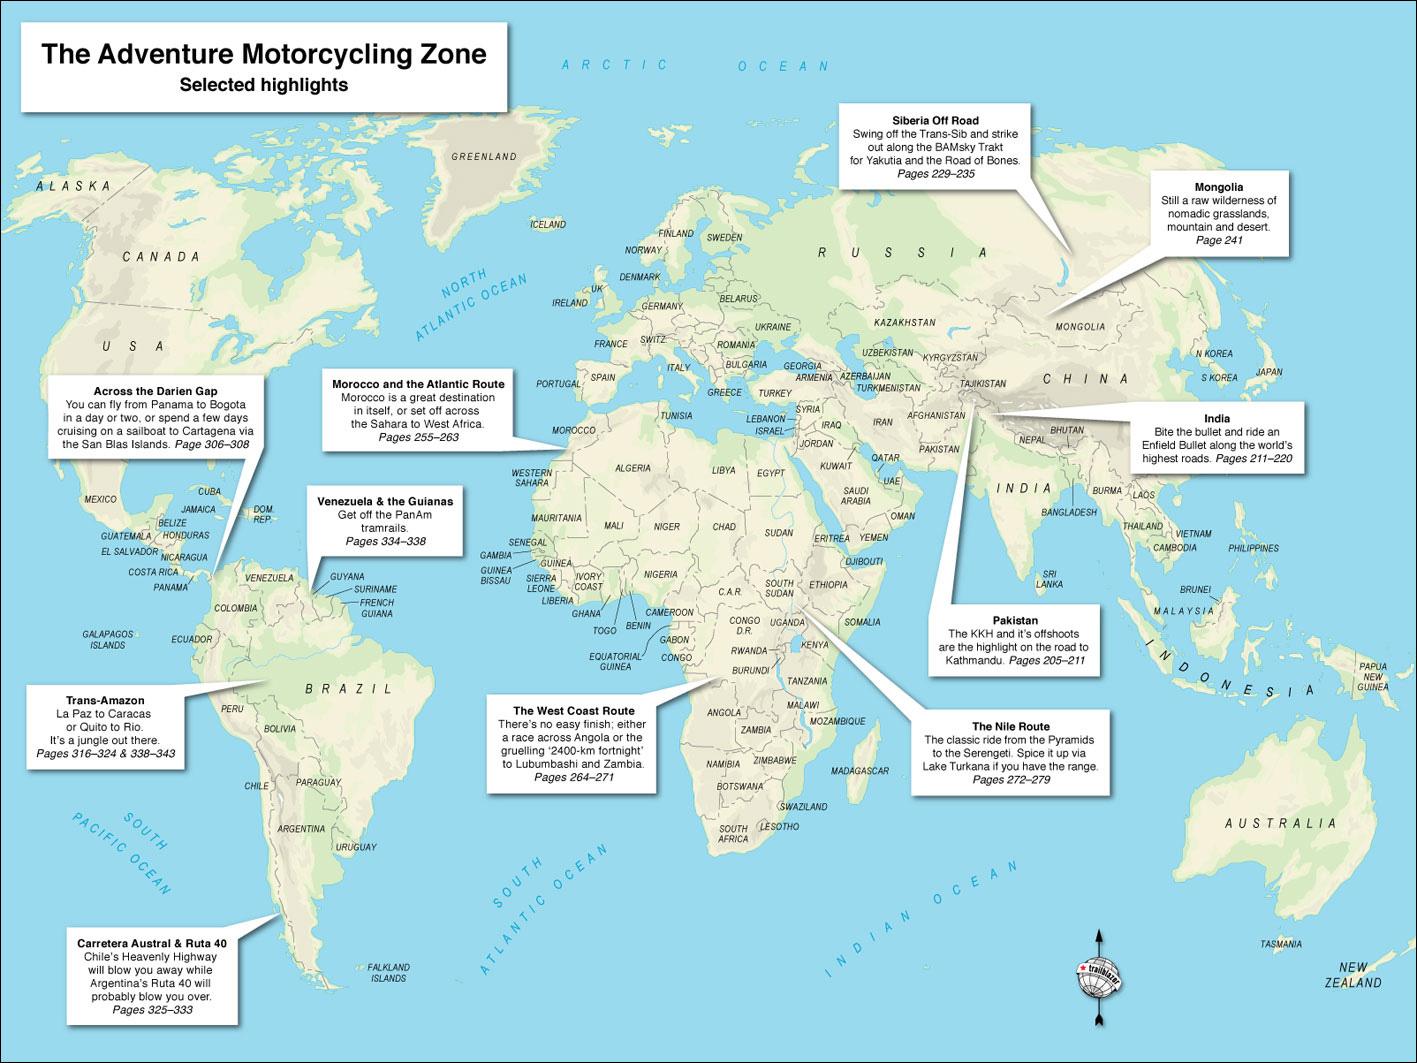 http://adventuremotorcyclinghandbook.files.wordpress.com/2012/02/amzmap.jpg